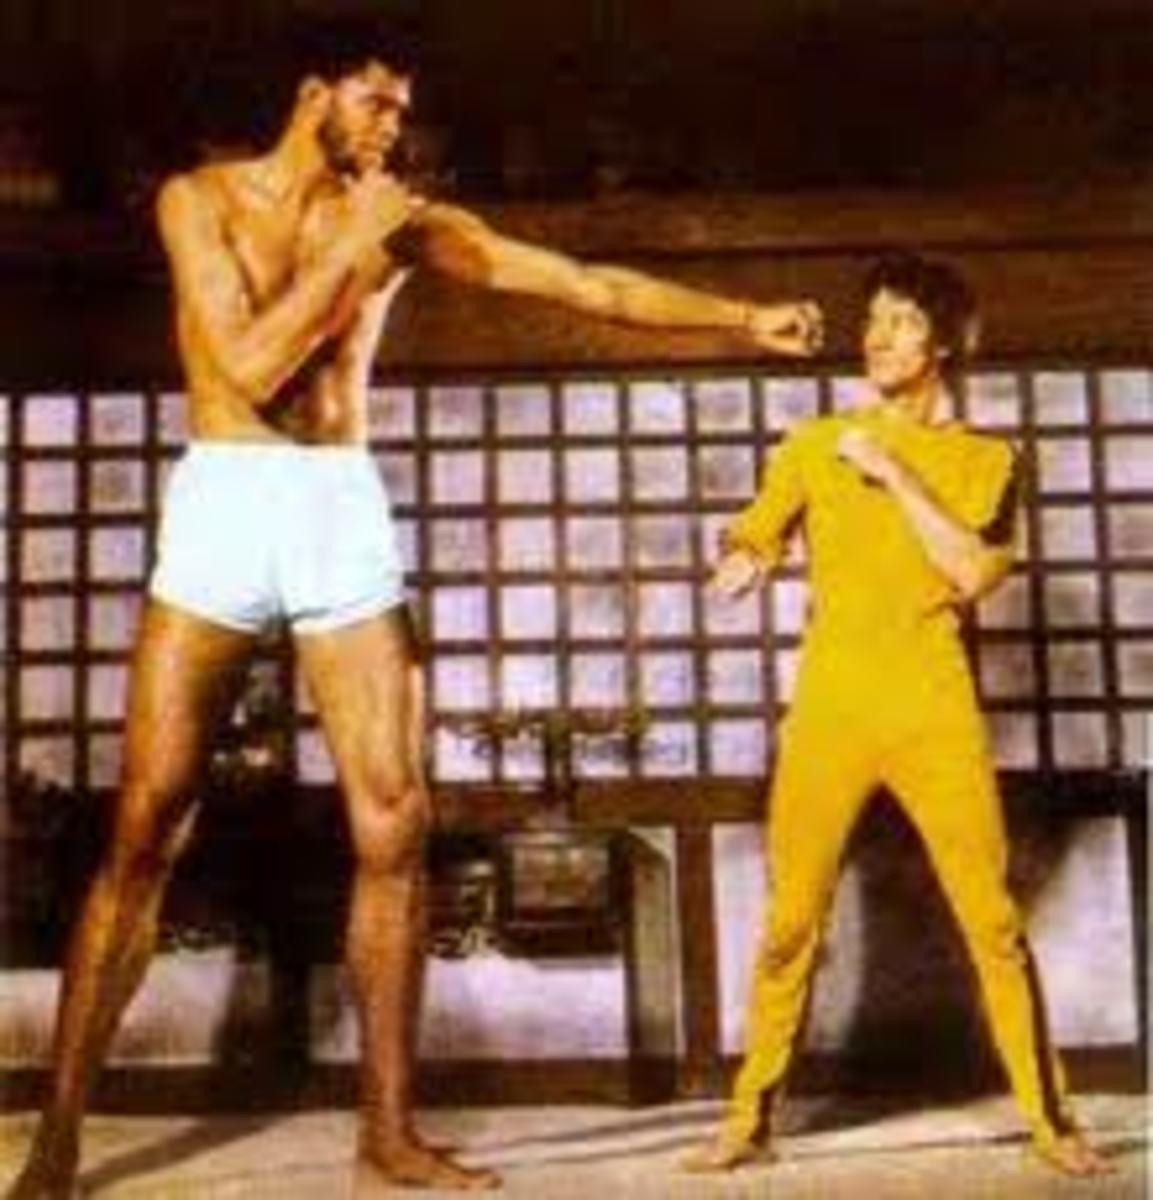 Kareem Abdul Jabbar 7 ft. 2  and Bruce 5 ft. 7